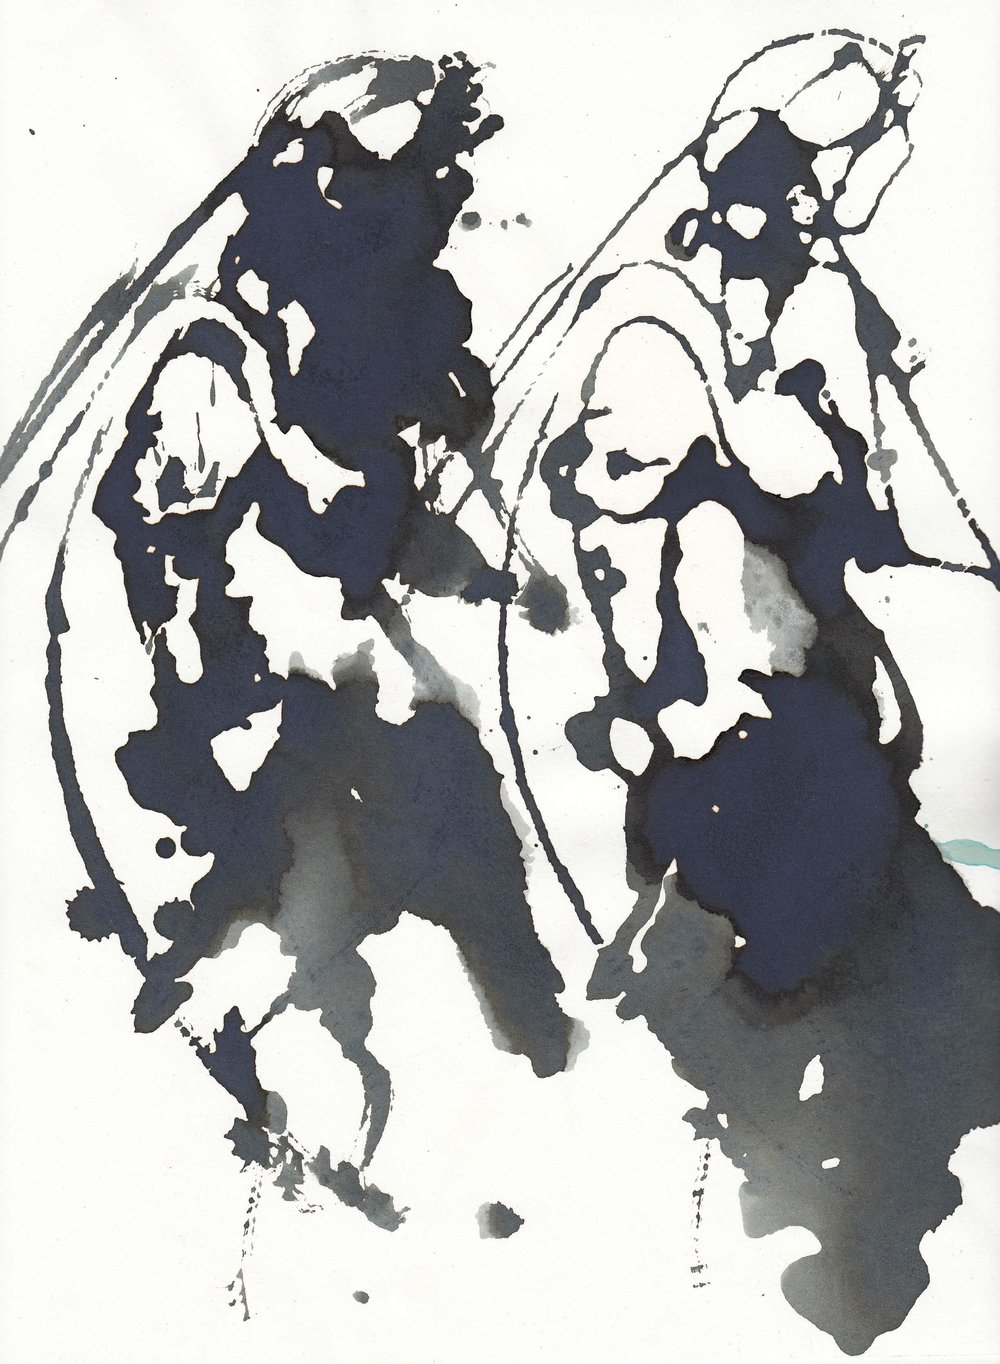 IMG_0064 copy.jpg